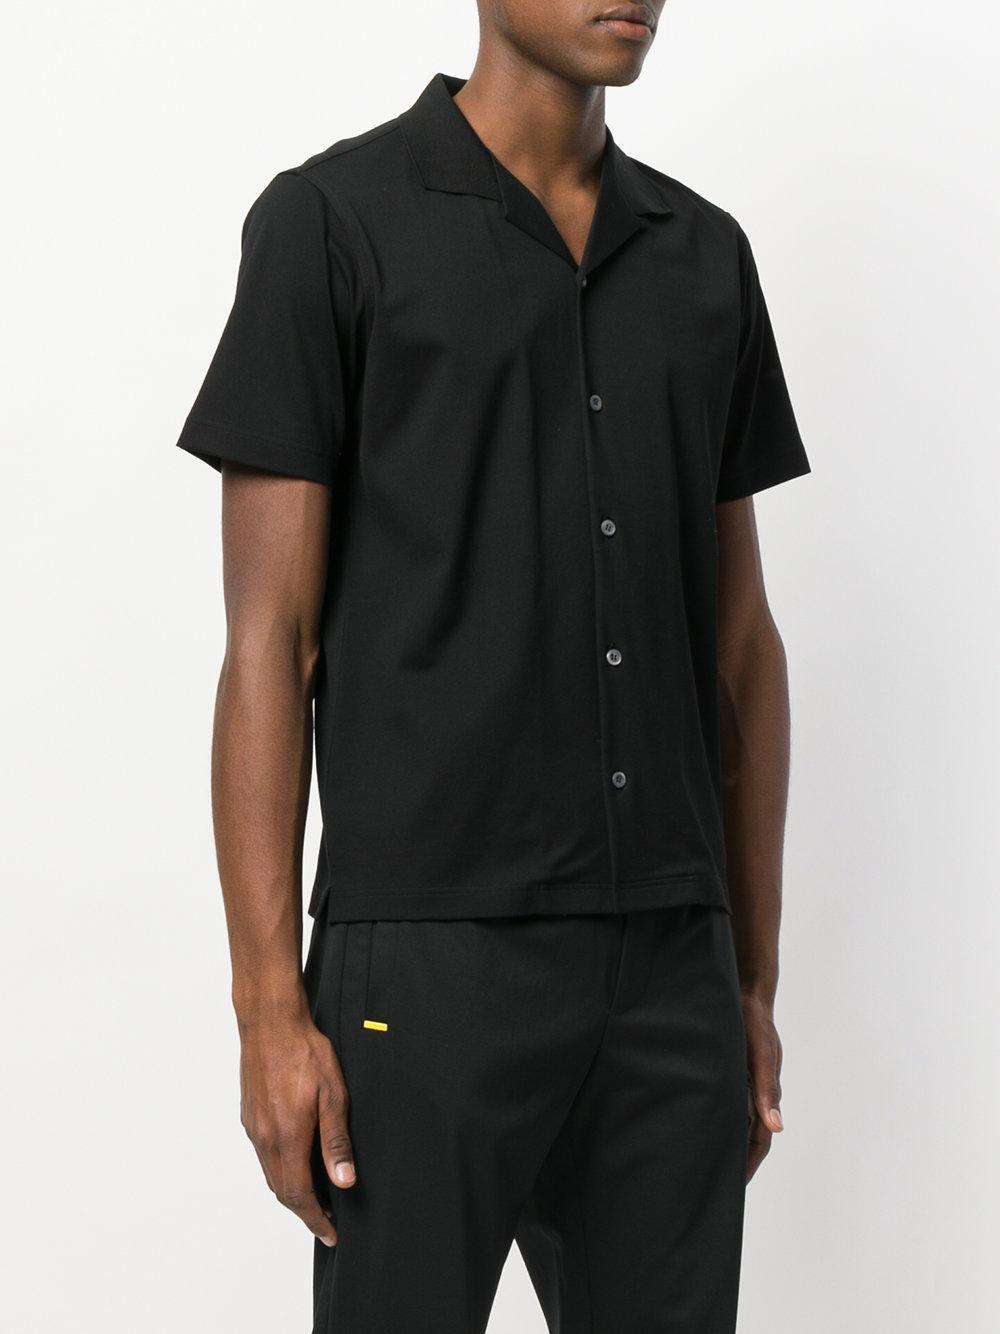 Prada Cotton Open Collar Bowling Shirt in Black for Men